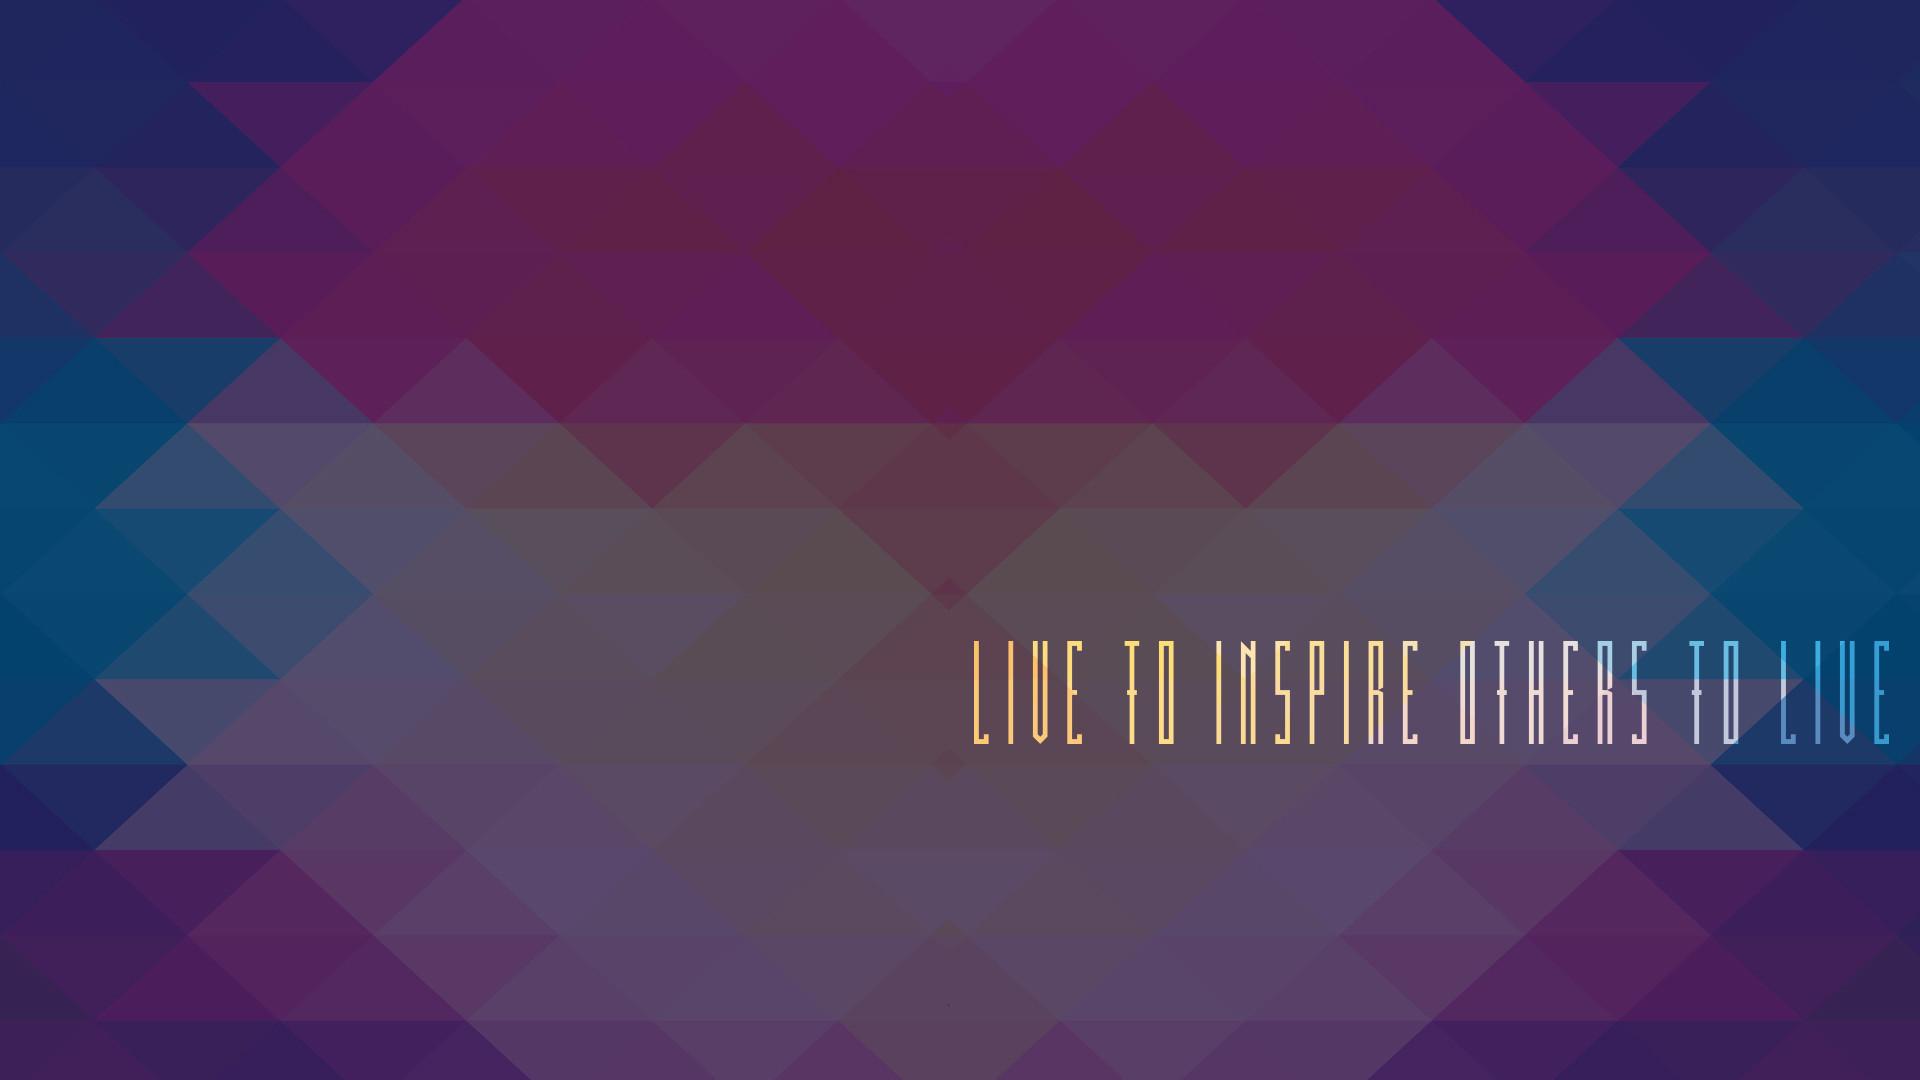 Res: 1920x1080, Motivational-wallpaper-quotes-31 115 Best Motivational Wallpaper Examples  with Inspiring Quotes